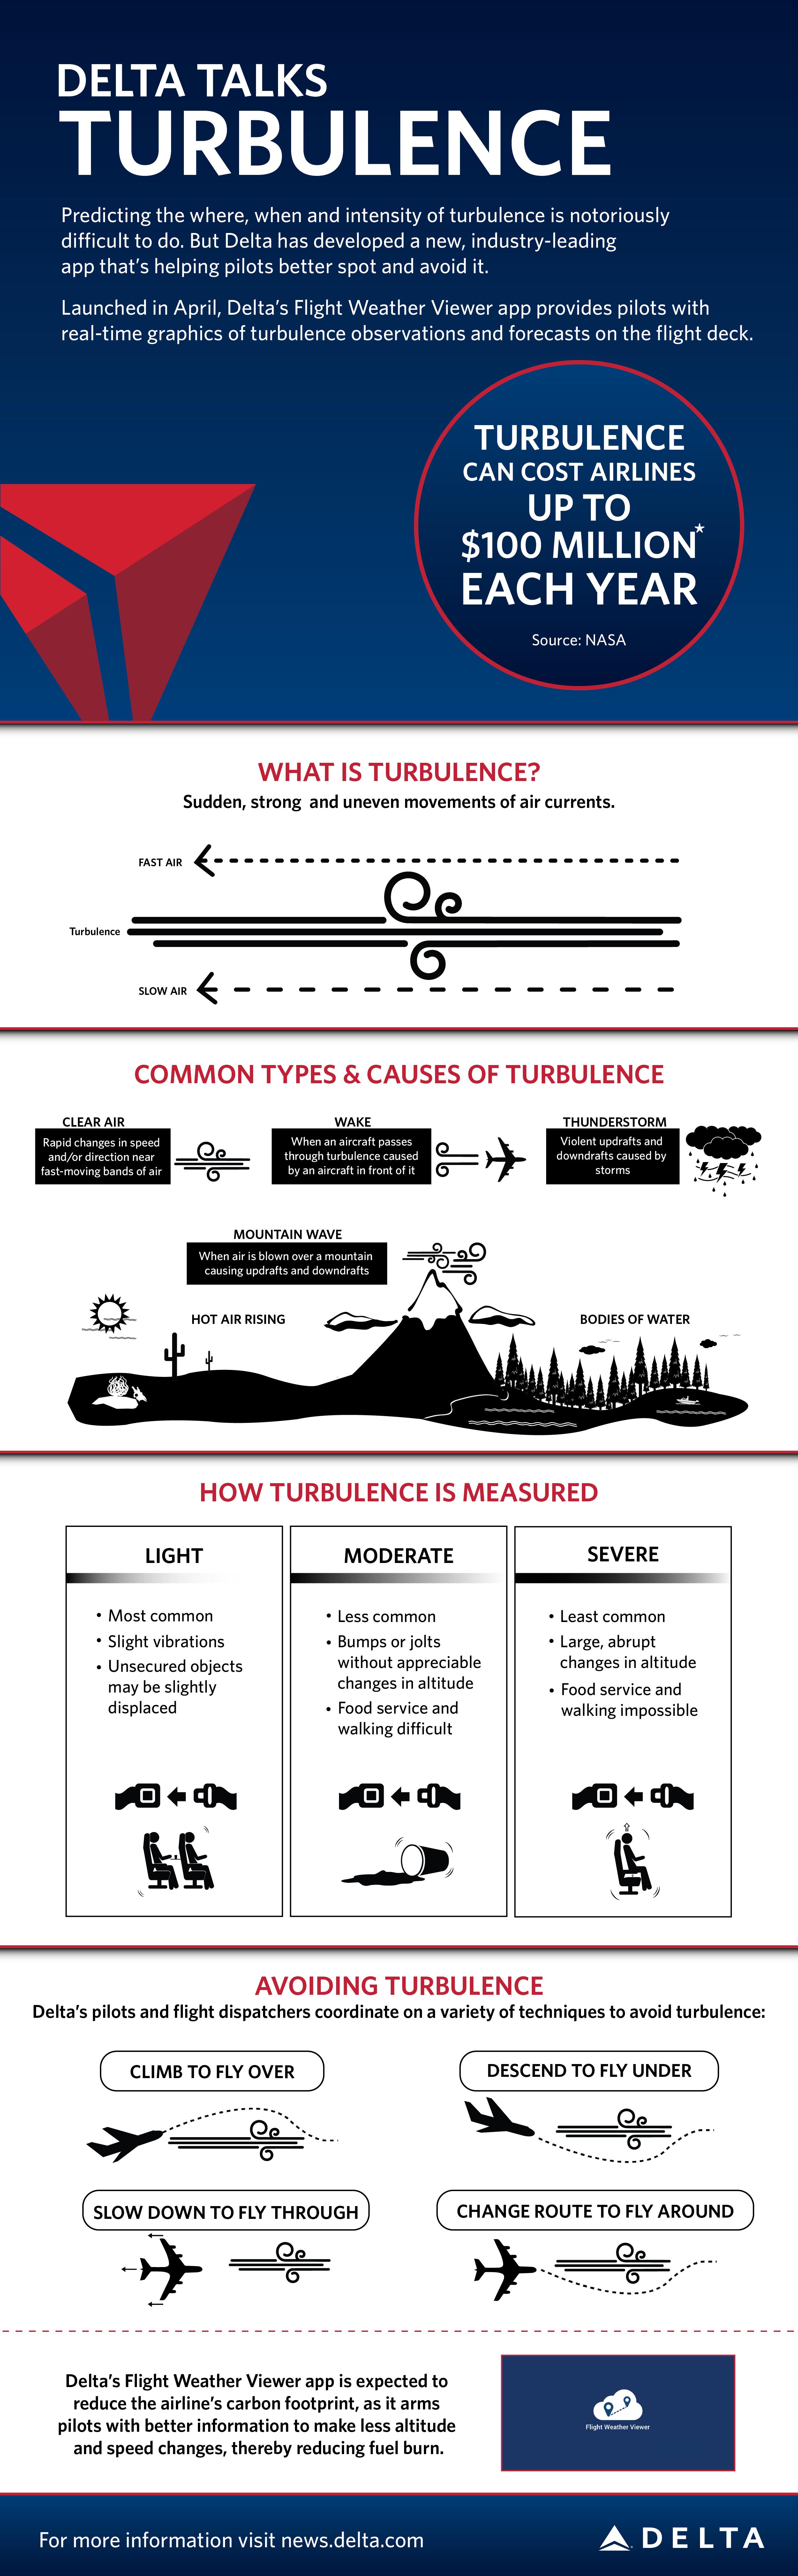 Delta Air Lines Turbulence